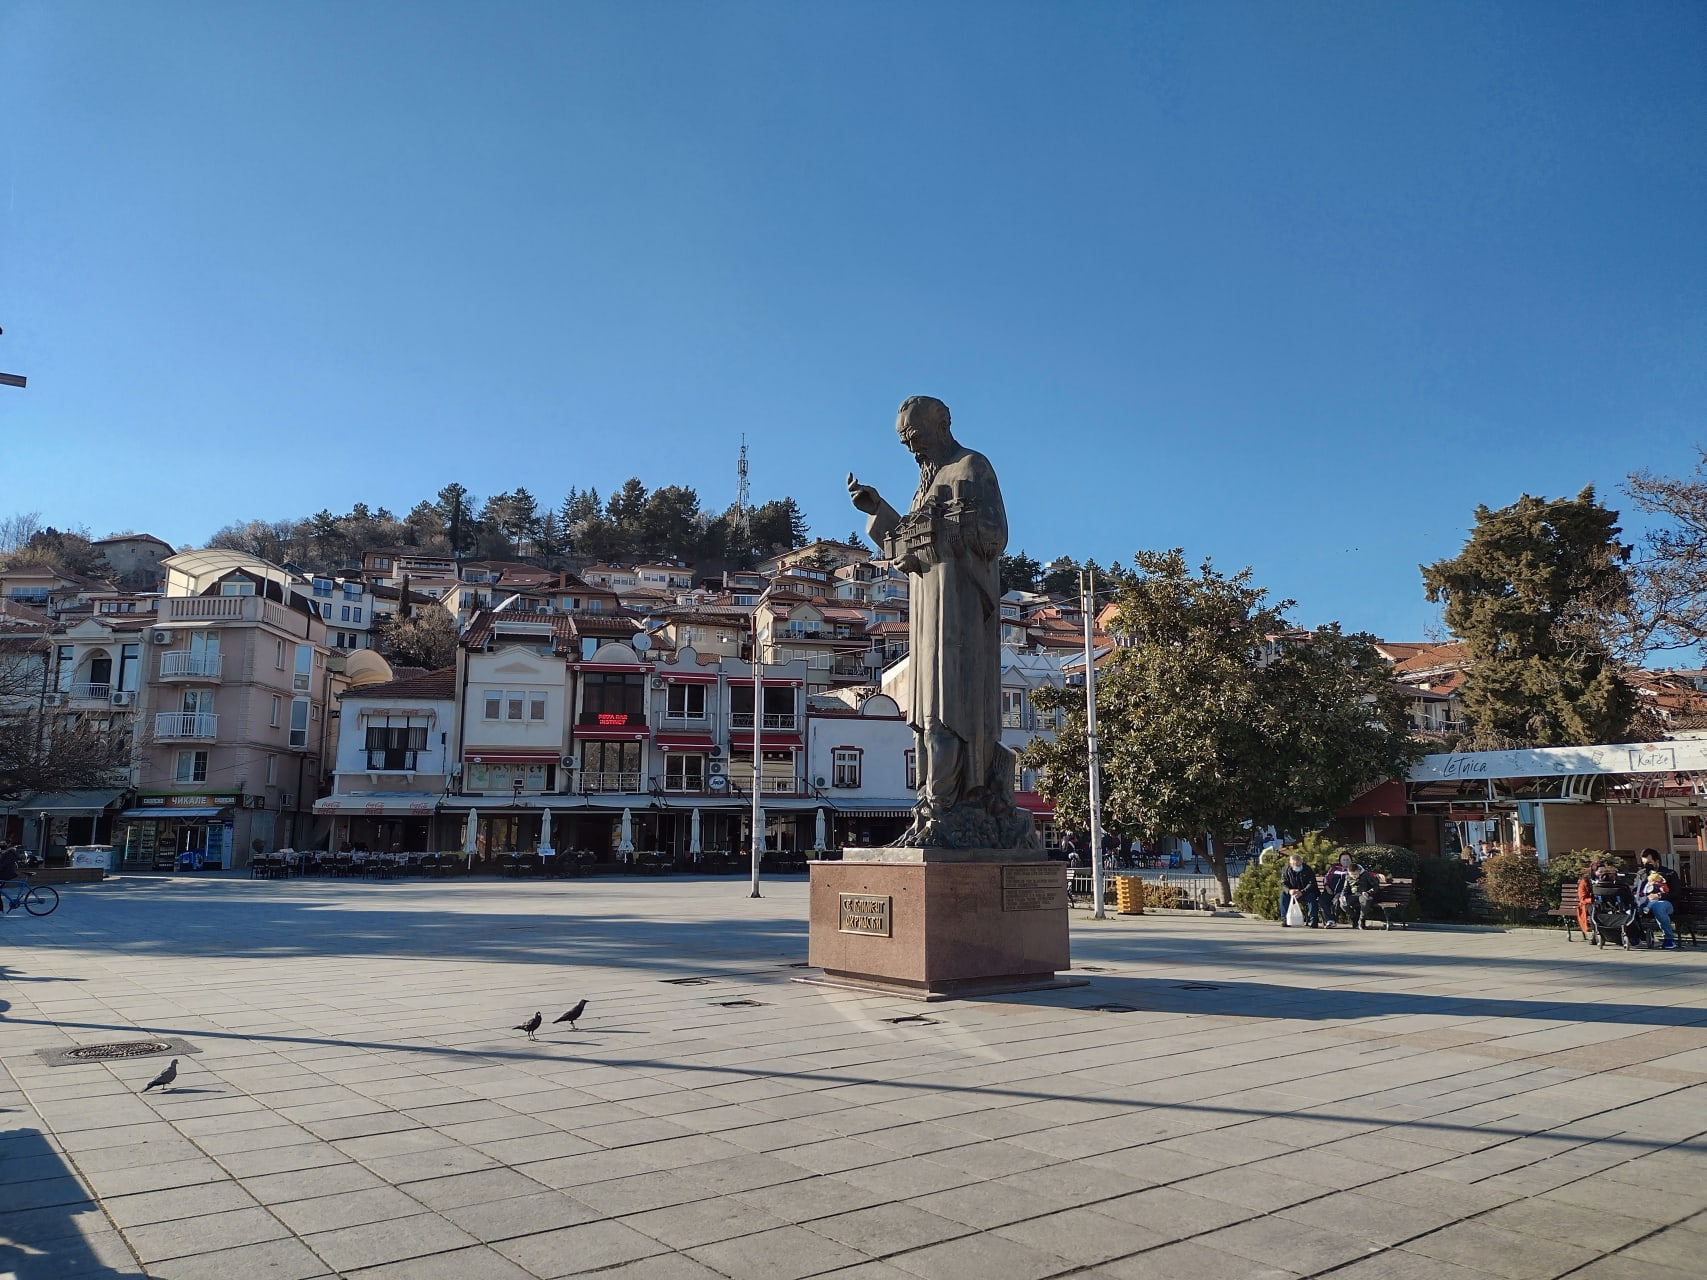 Ohrid - A walk in the Ohrid bazaar